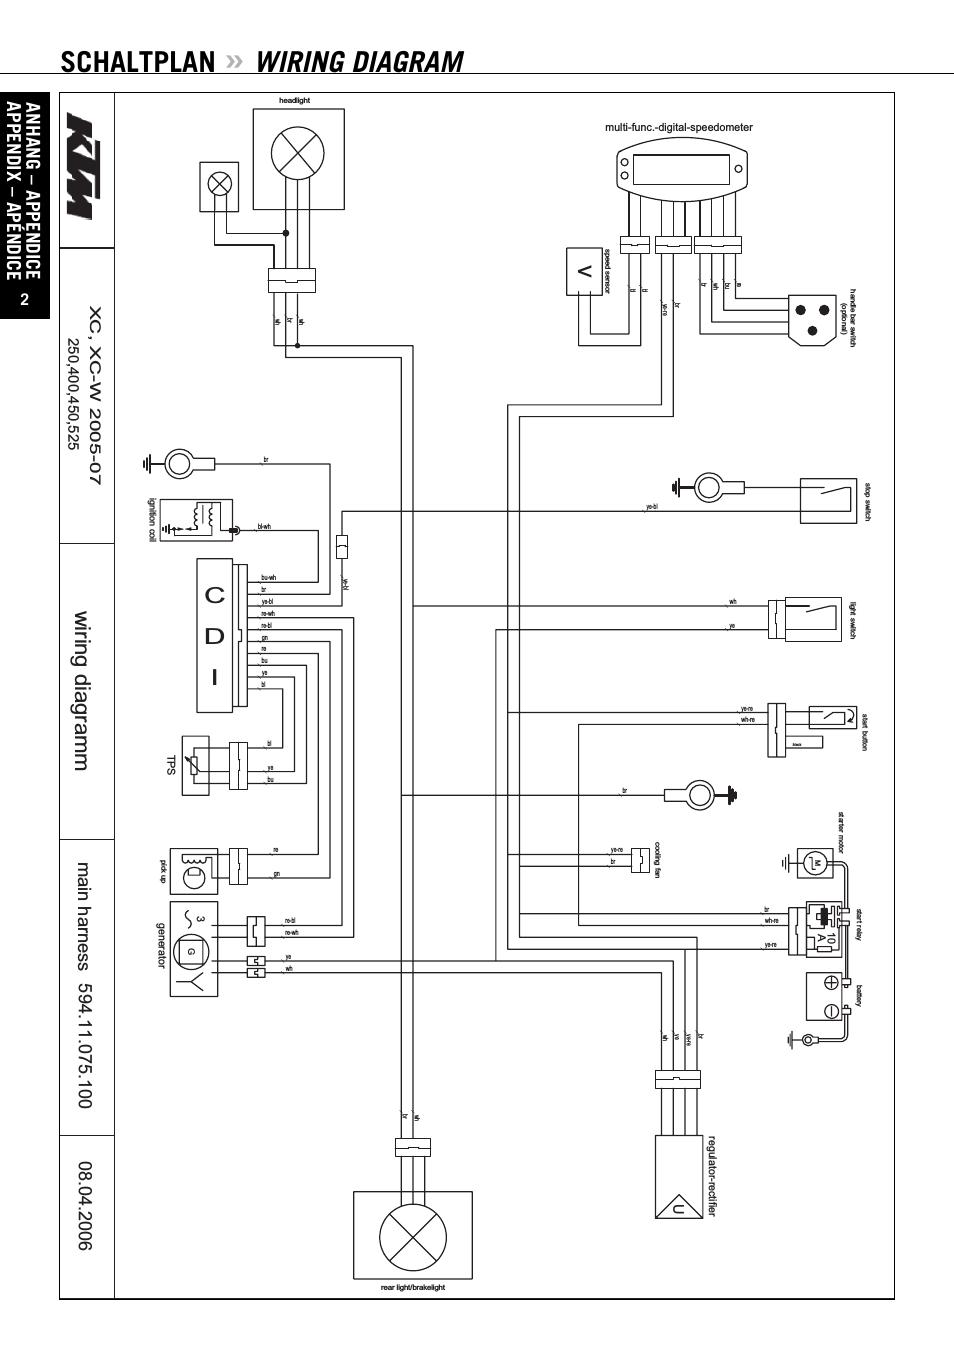 dv_8797] ktm 250 xc wiring diagram free diagram  tixat inkl lopla antus exmet omit garna mohammedshrine librar wiring 101